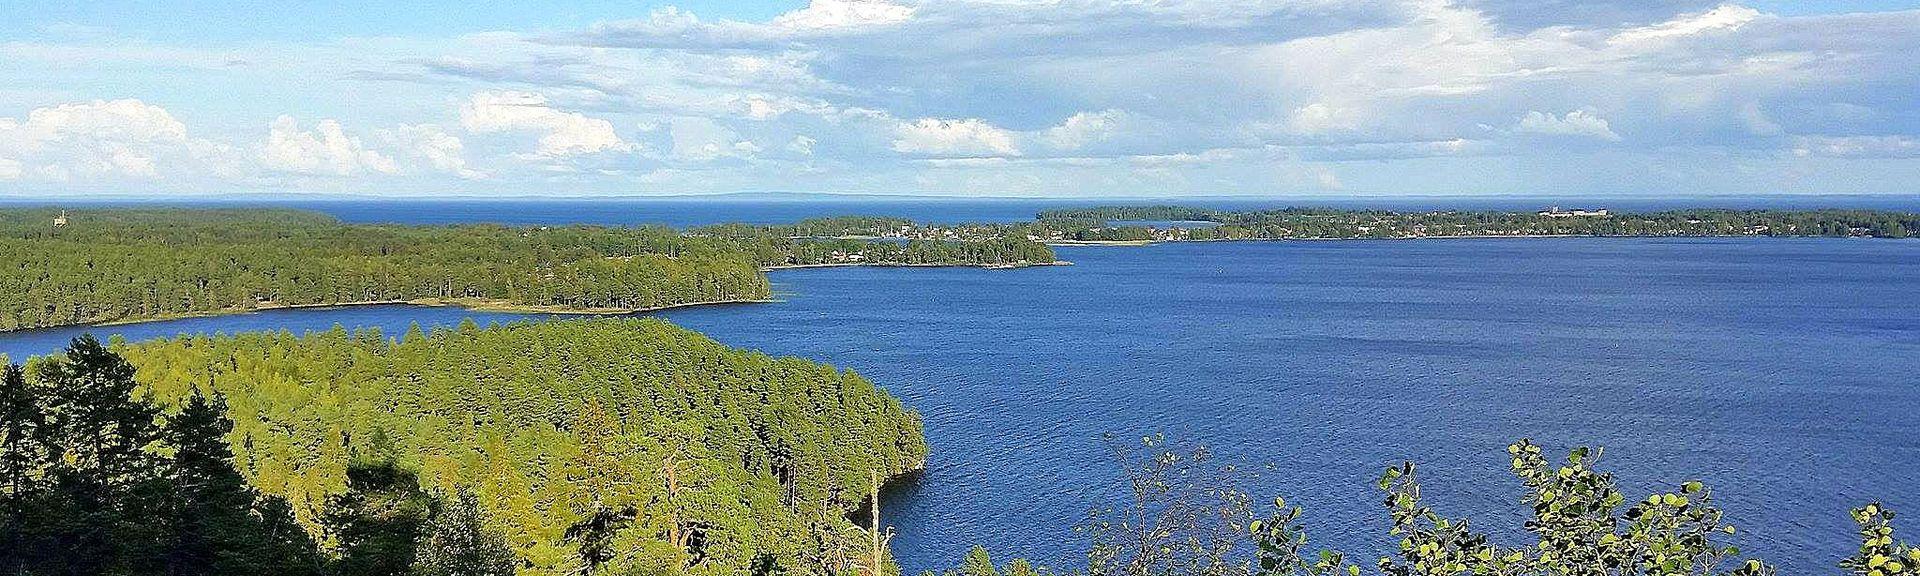 Província de Västra Götaland, Suécia